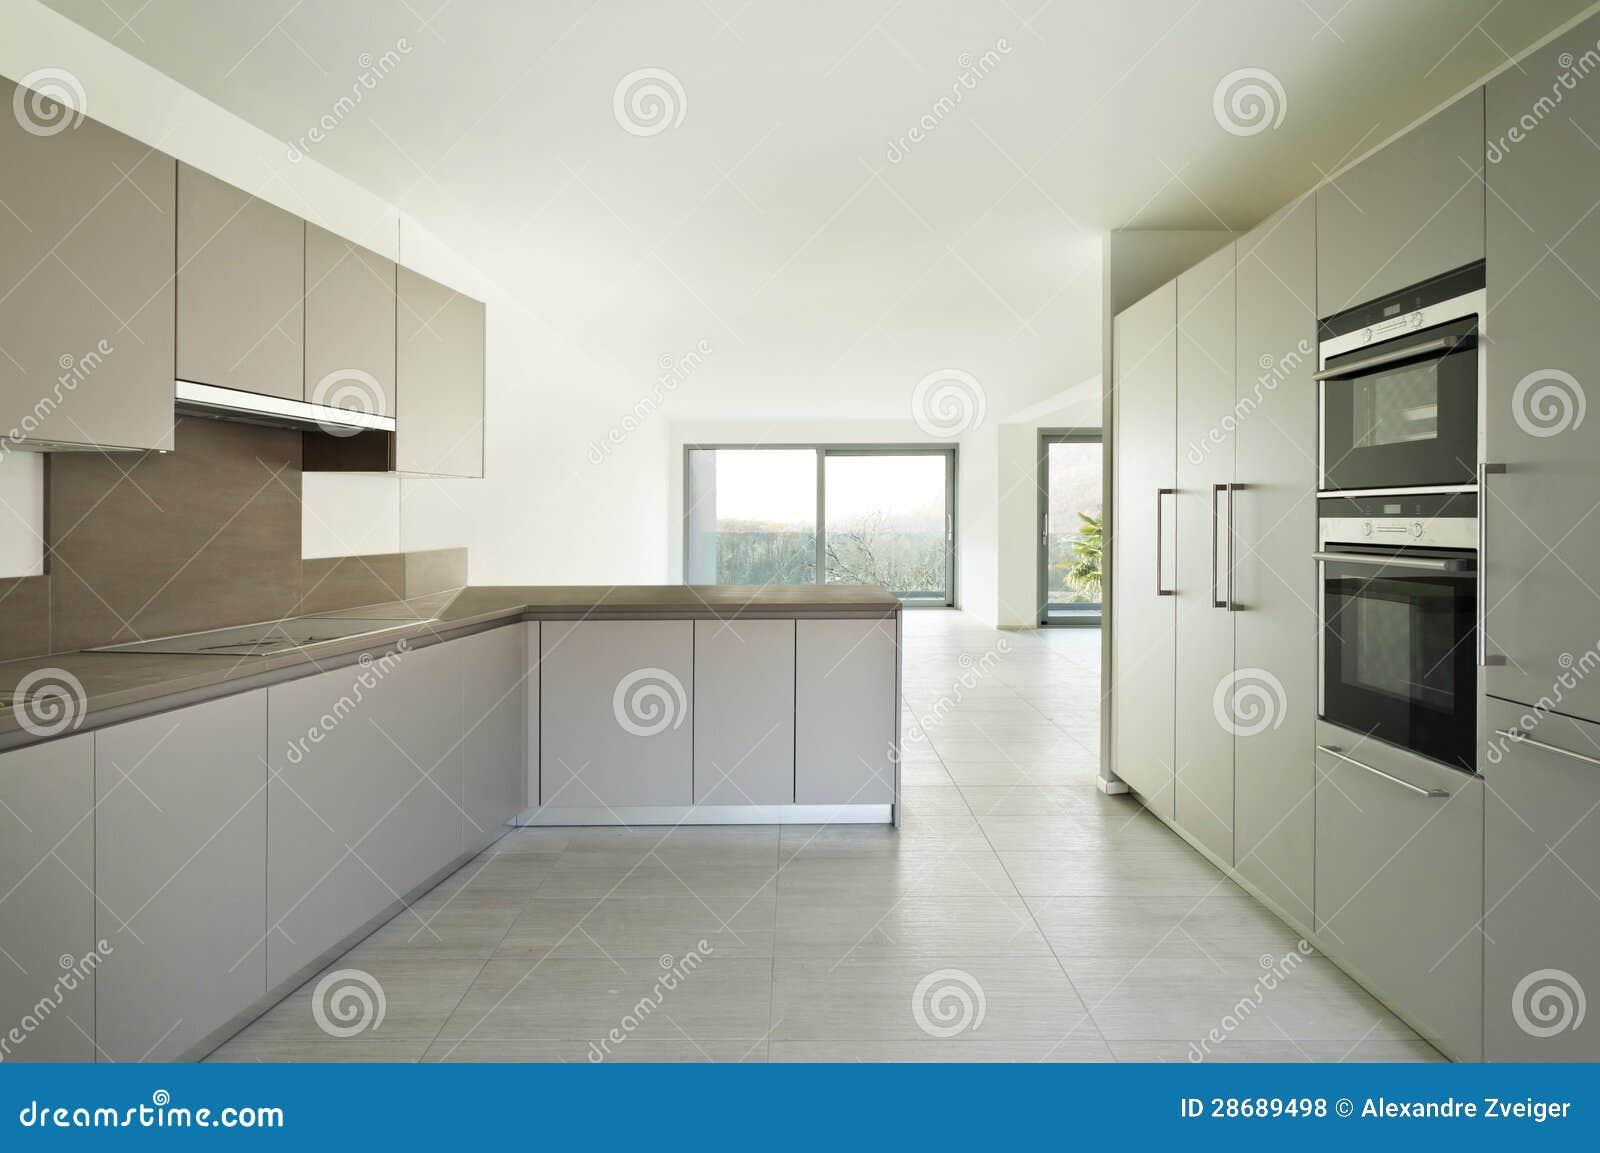 New Empty Apartment Kitchen Royalty Free Stock Photos